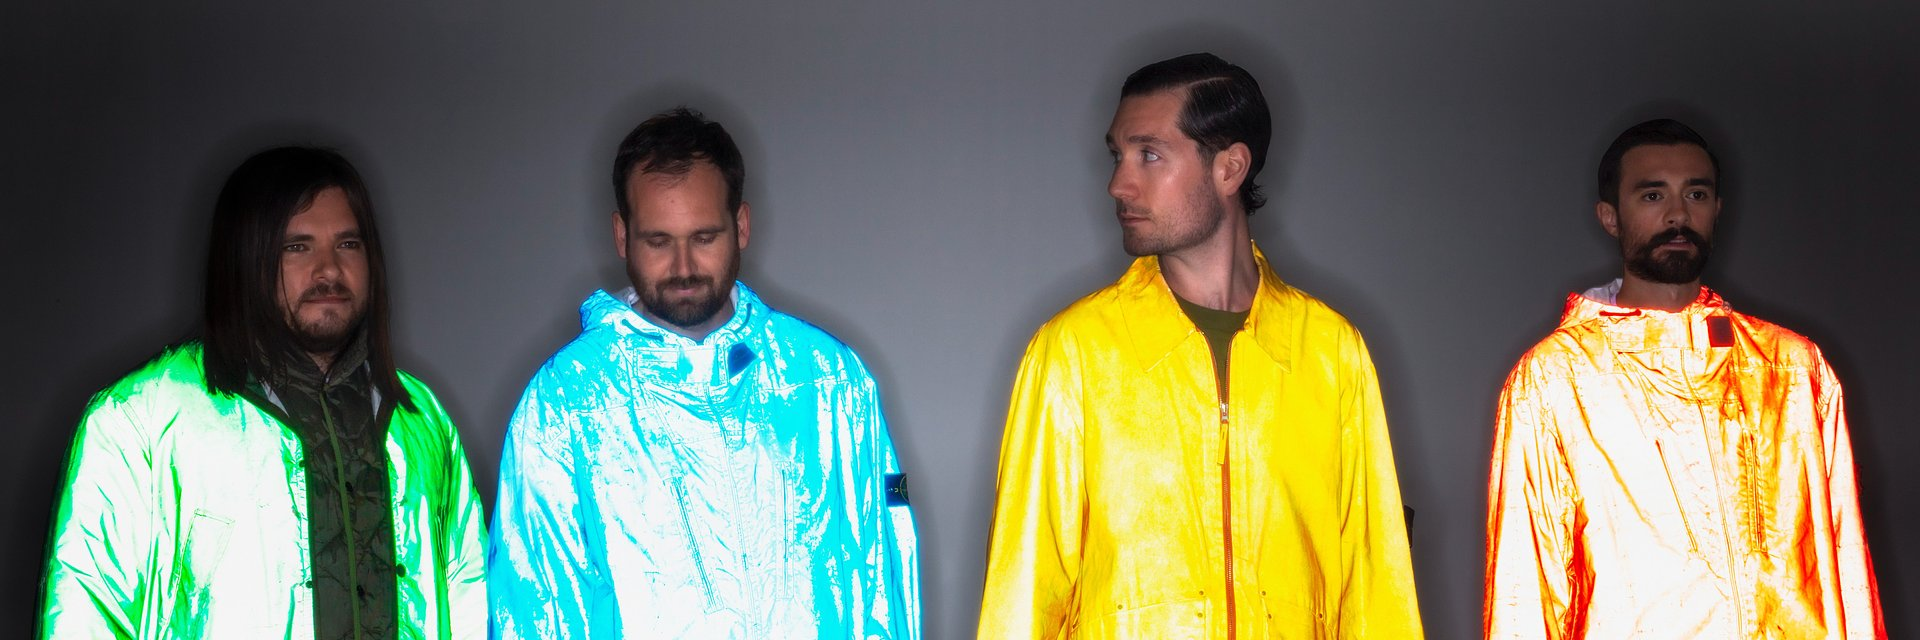 "Bastille prezentują nowy utwór ""Give Me The Future"""